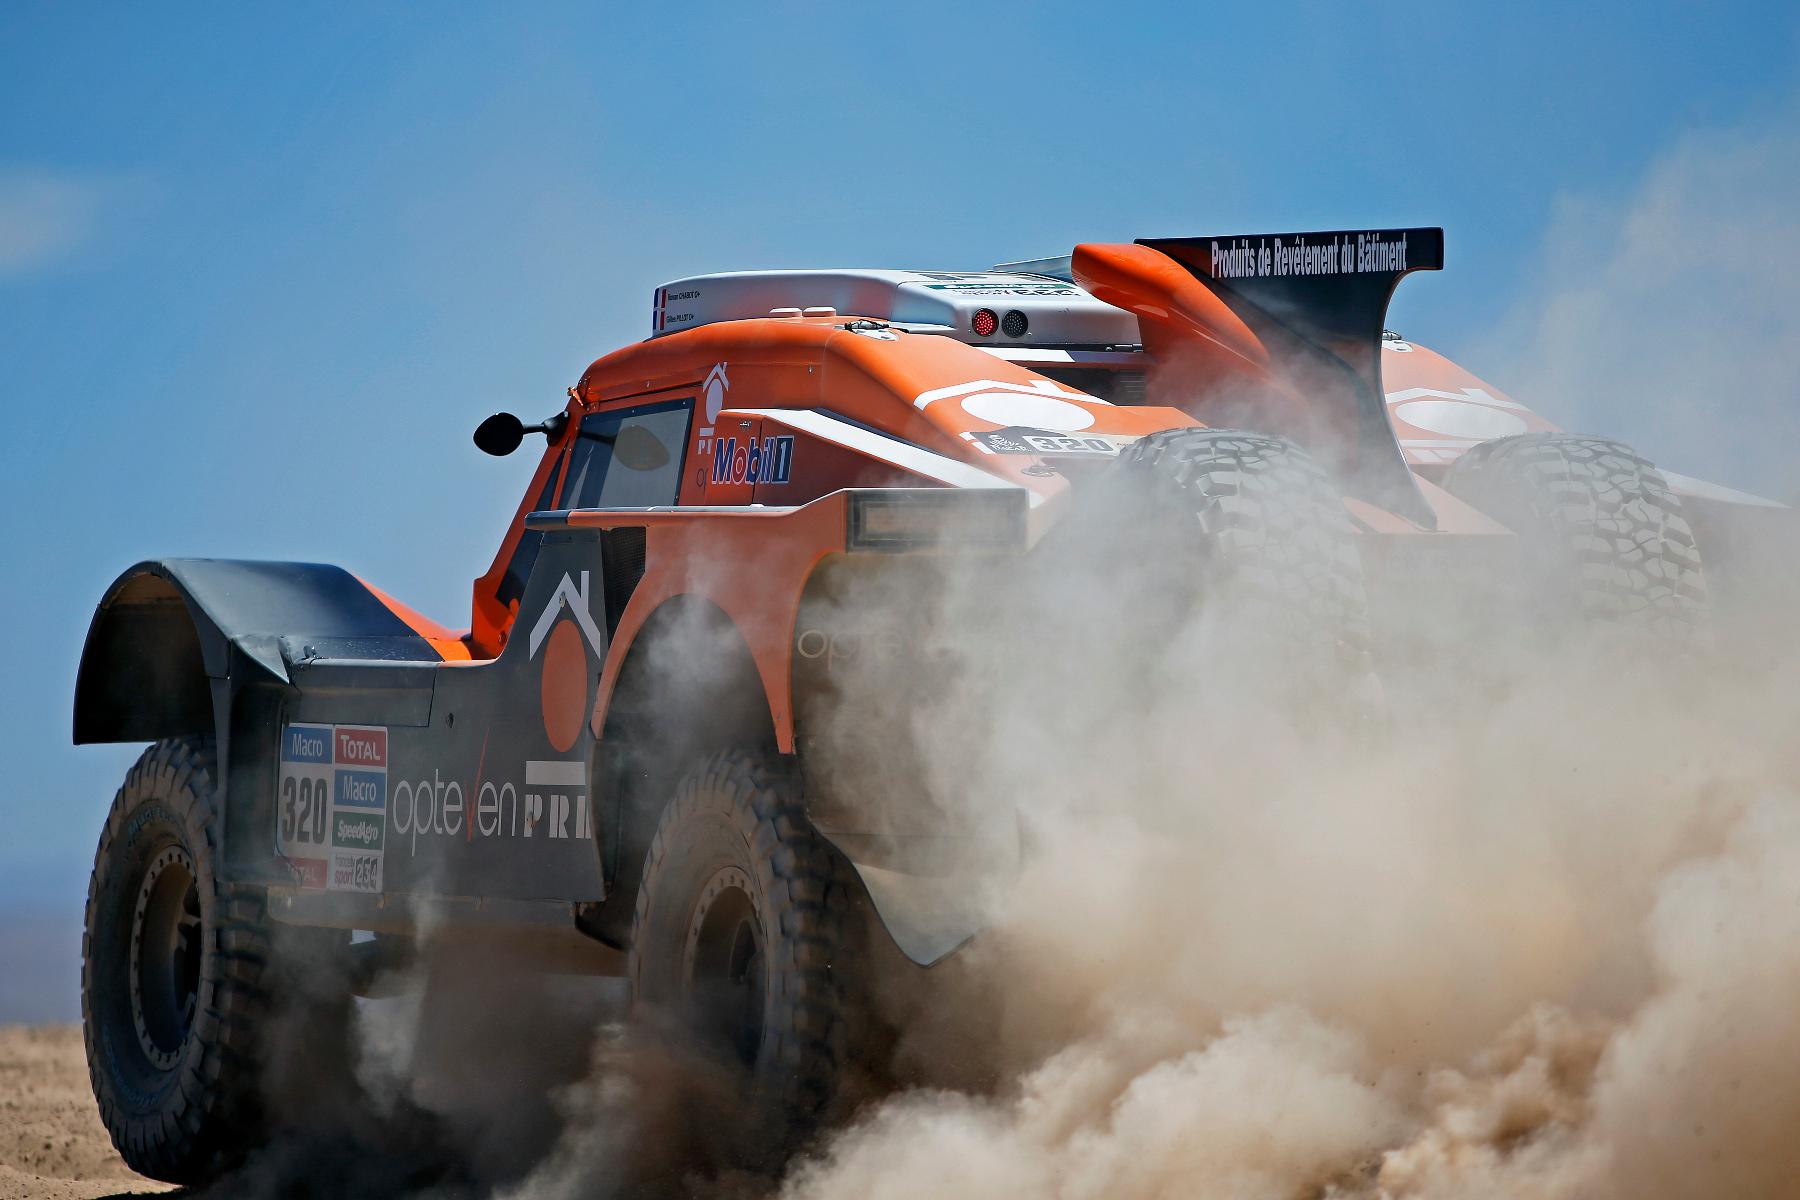 320 CHABOT Ronan (Fra) PILLOT Gilles (Fra) Smg action  during the Dakar 2015 Argentina Bolivia Chile, Stage 5 / Etape 5 -  Copiapo to Antofagasta on January 8th 2015 at Copiapo, Chile. Photo Francois Flamand / DPPI